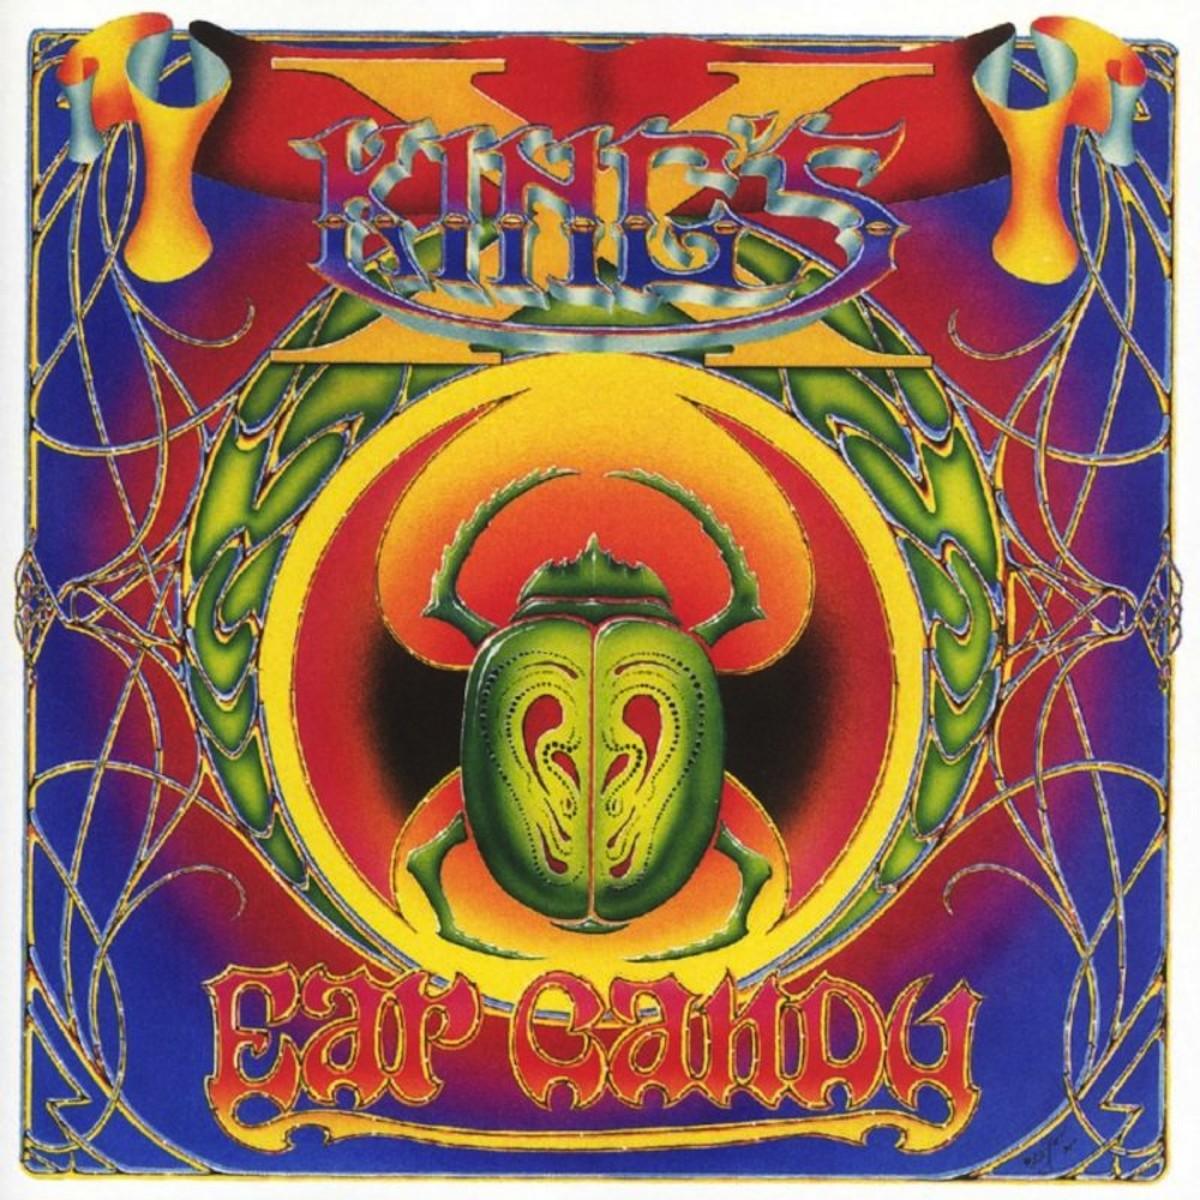 "King's X ""Ear Candy"" Atlantic Records 82880-2 CD Album US Pressing (1996) CD Album Cover Art by Alton Kelley"